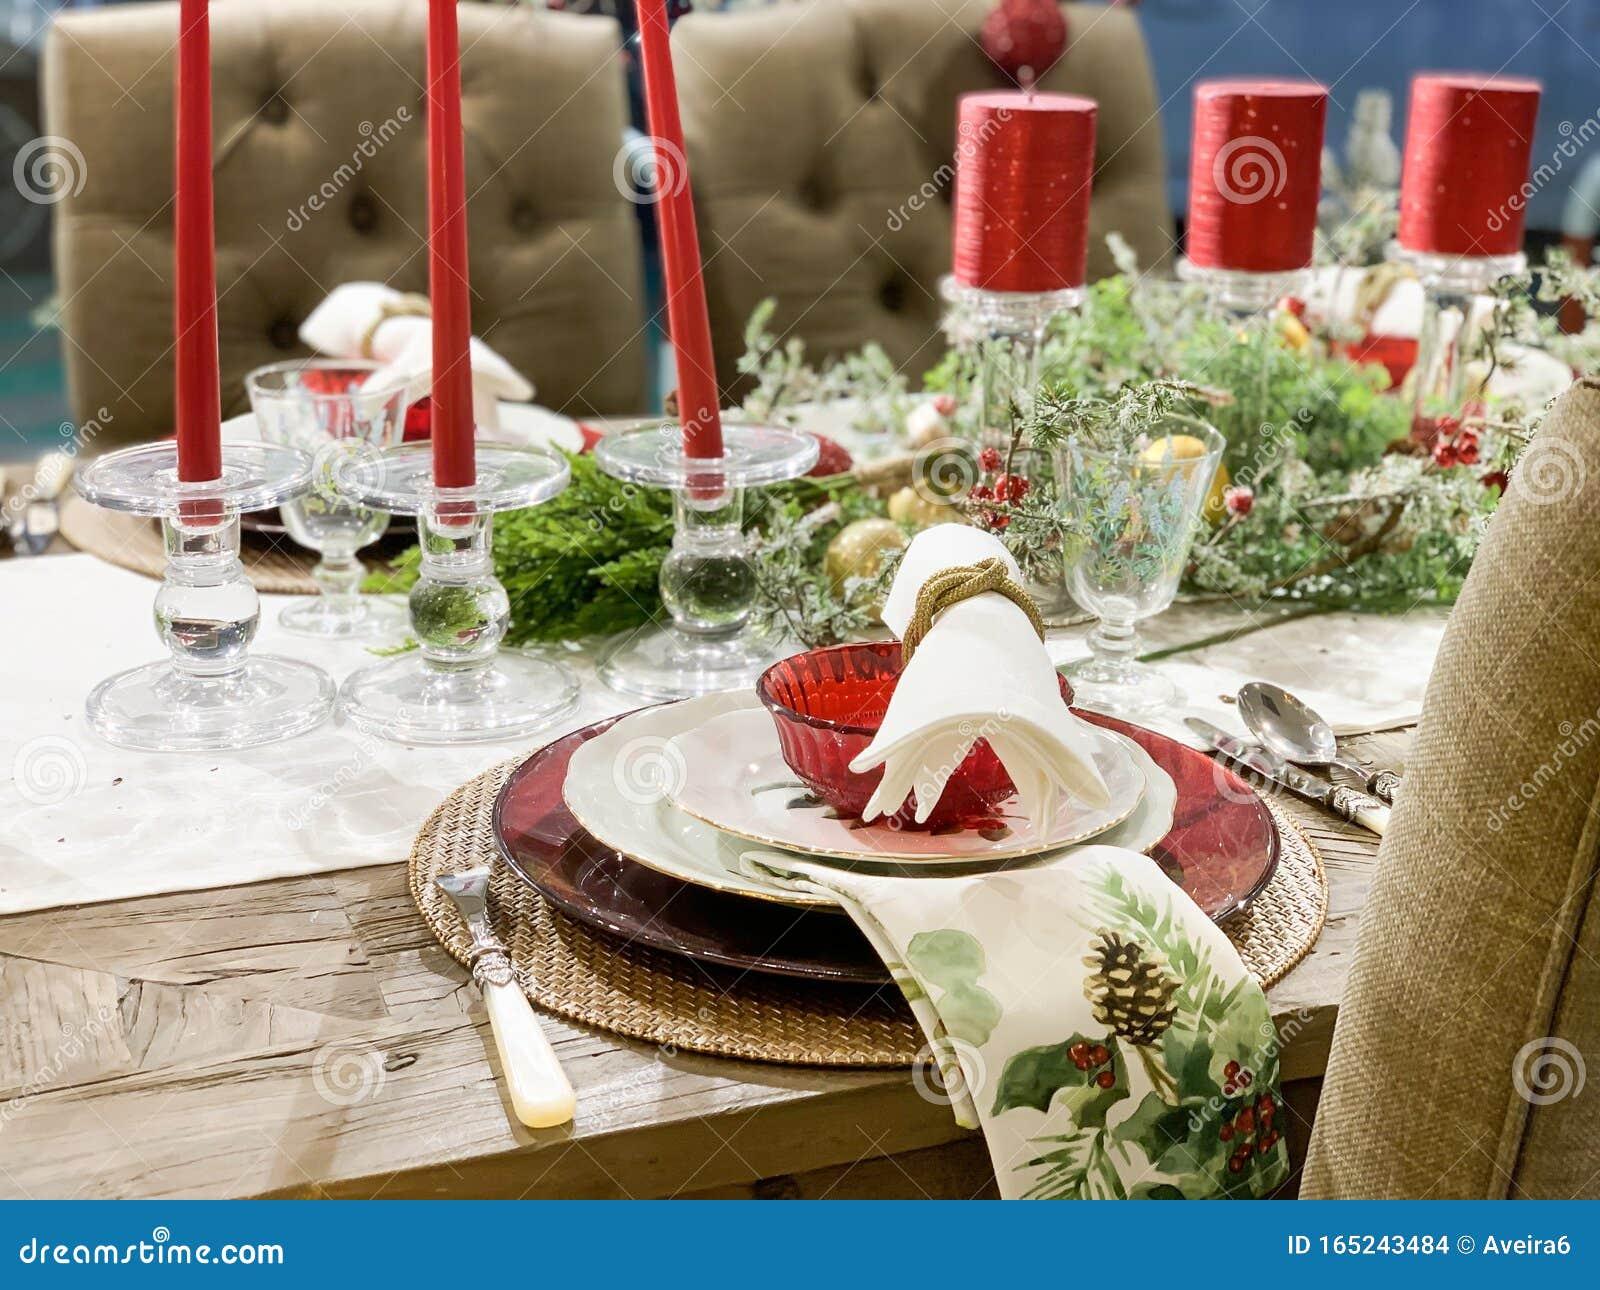 Elegant Christmas Dinner Table Decoration Stock Photo Image Of Table Napkin 165243484